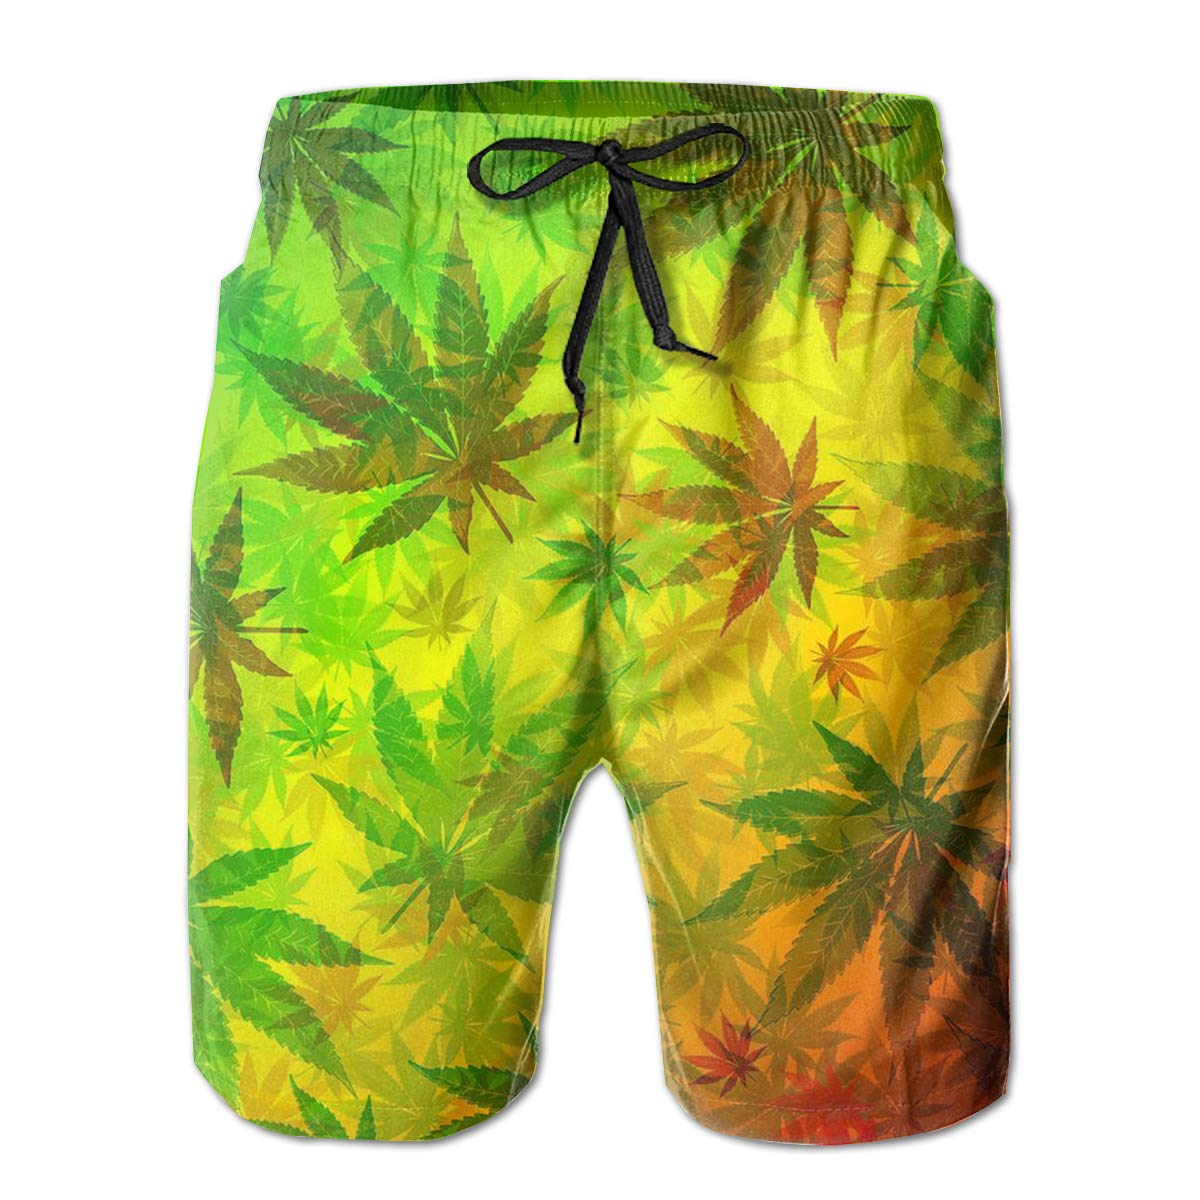 MikonsuWeed Reggae Mens Beachwear Surfing Boardshorts with Pocket